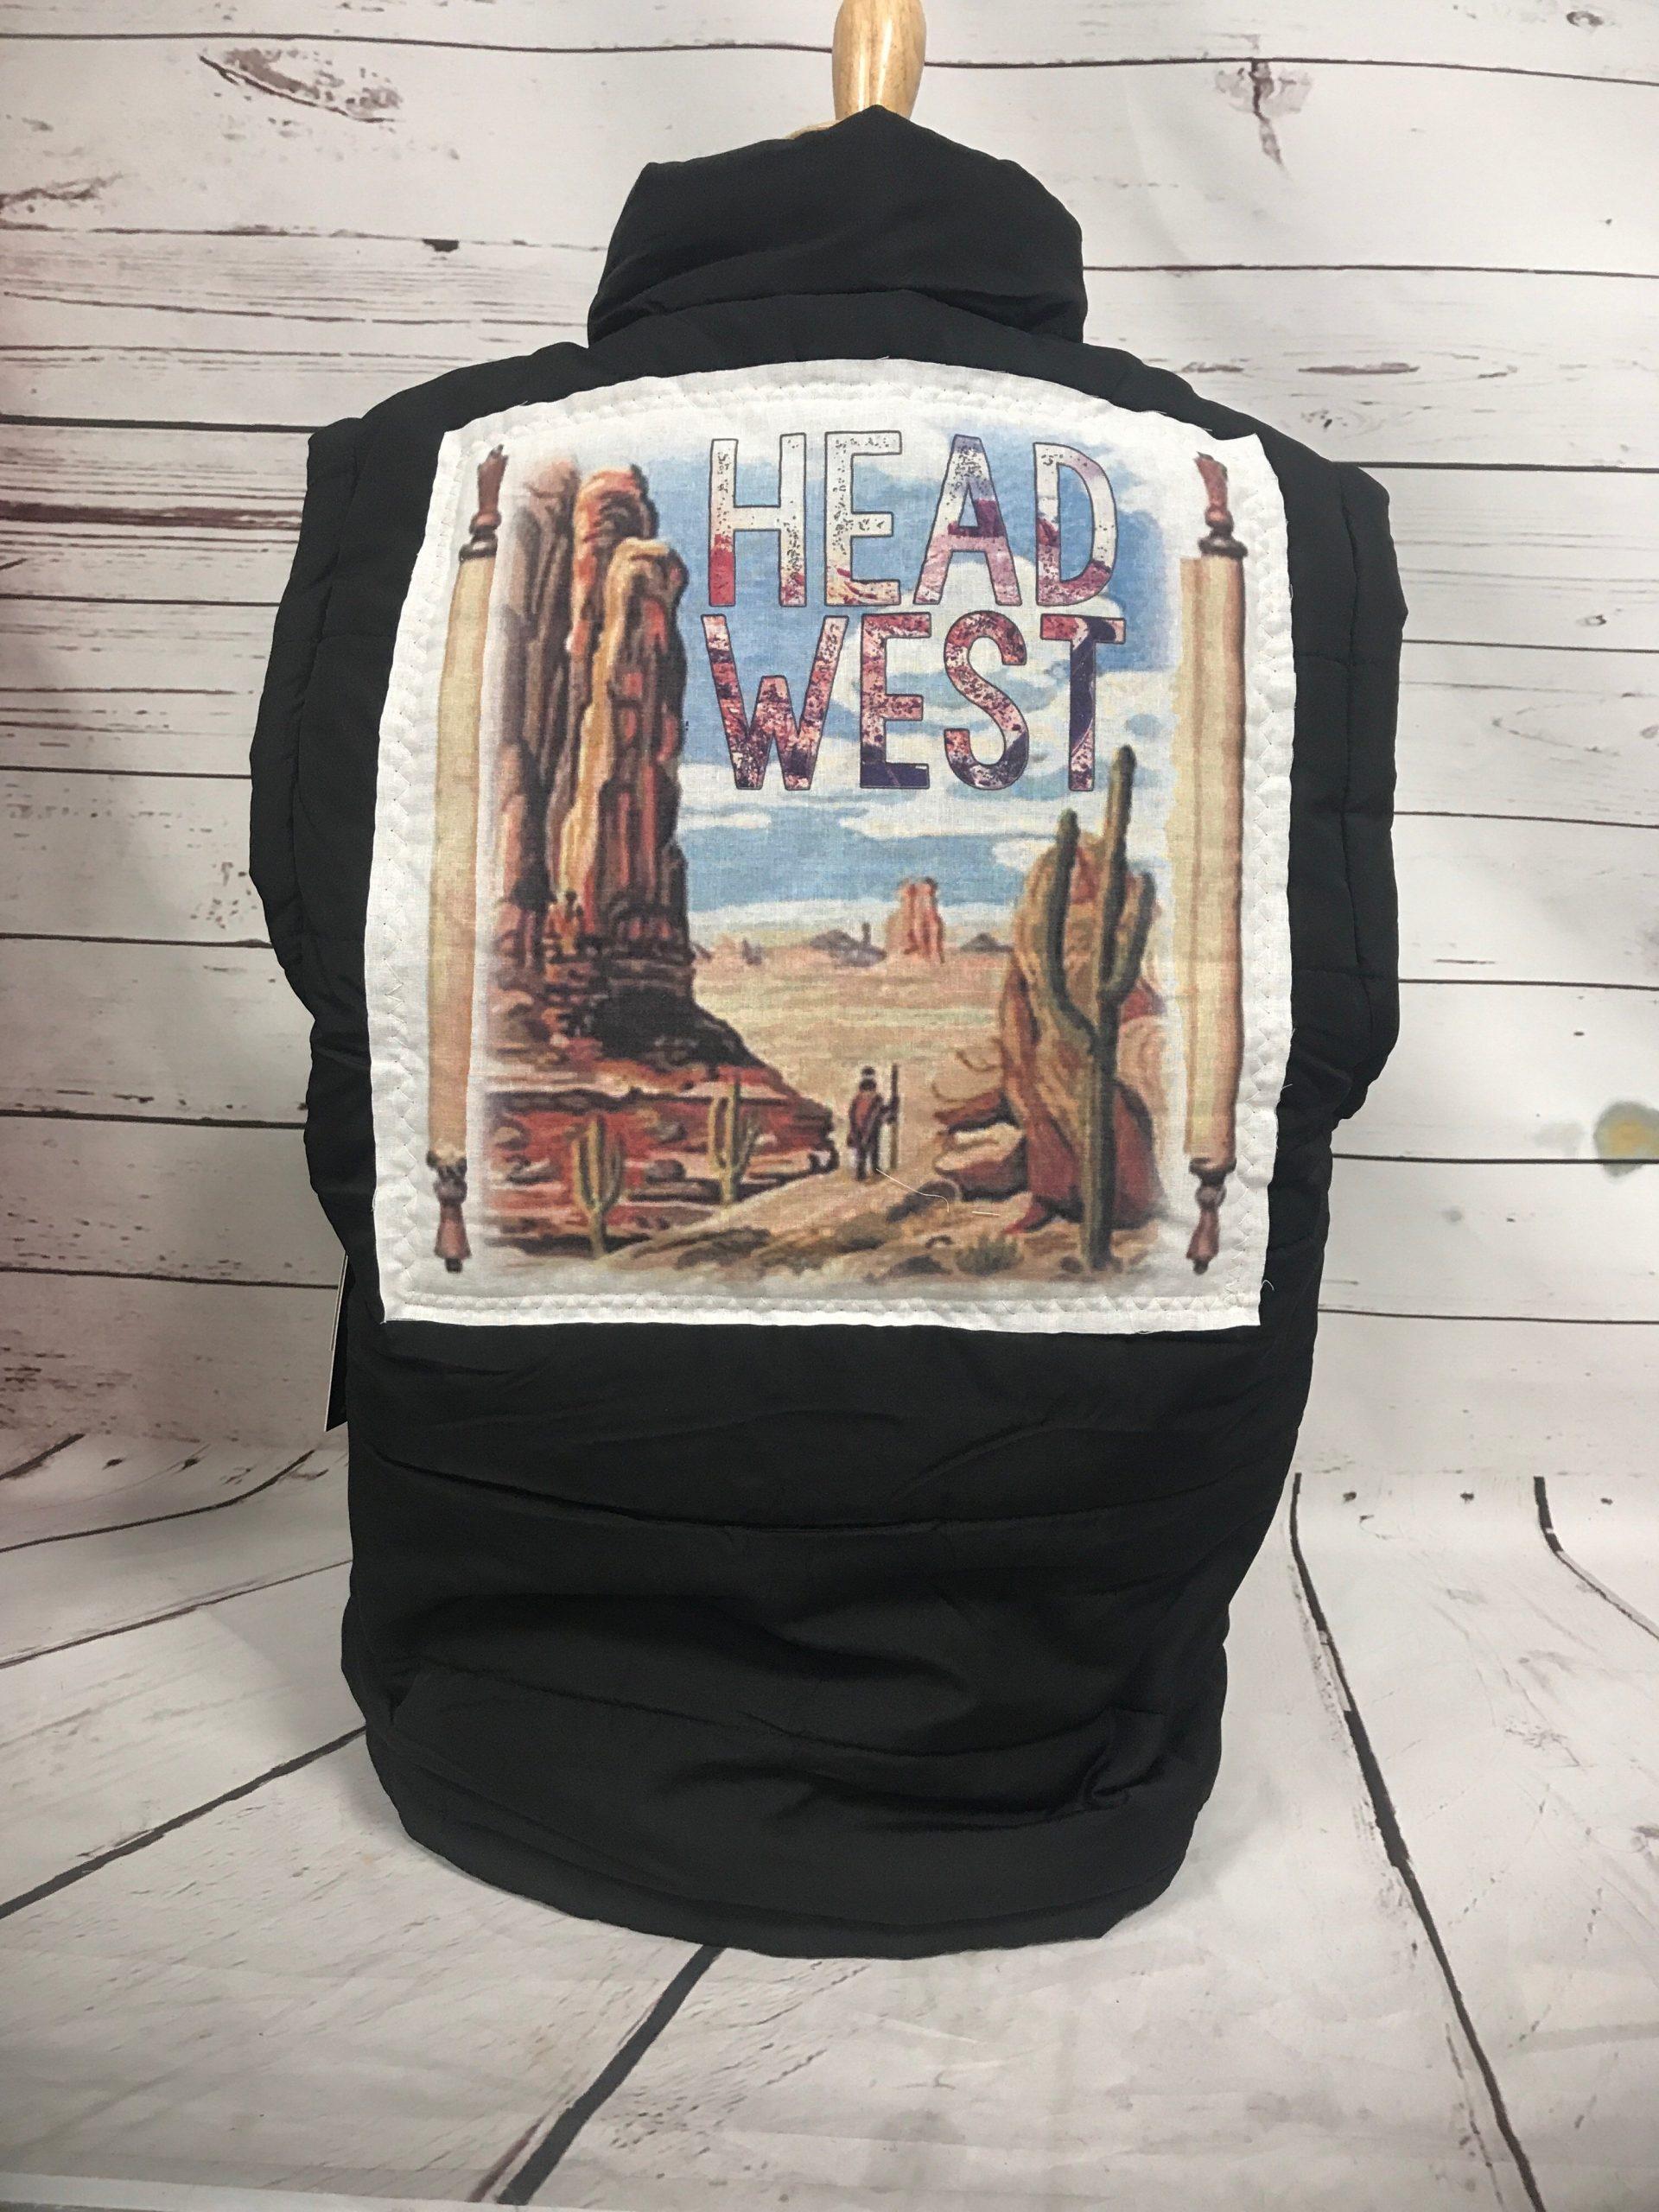 Head West Cream Patch on Black Puff Vest